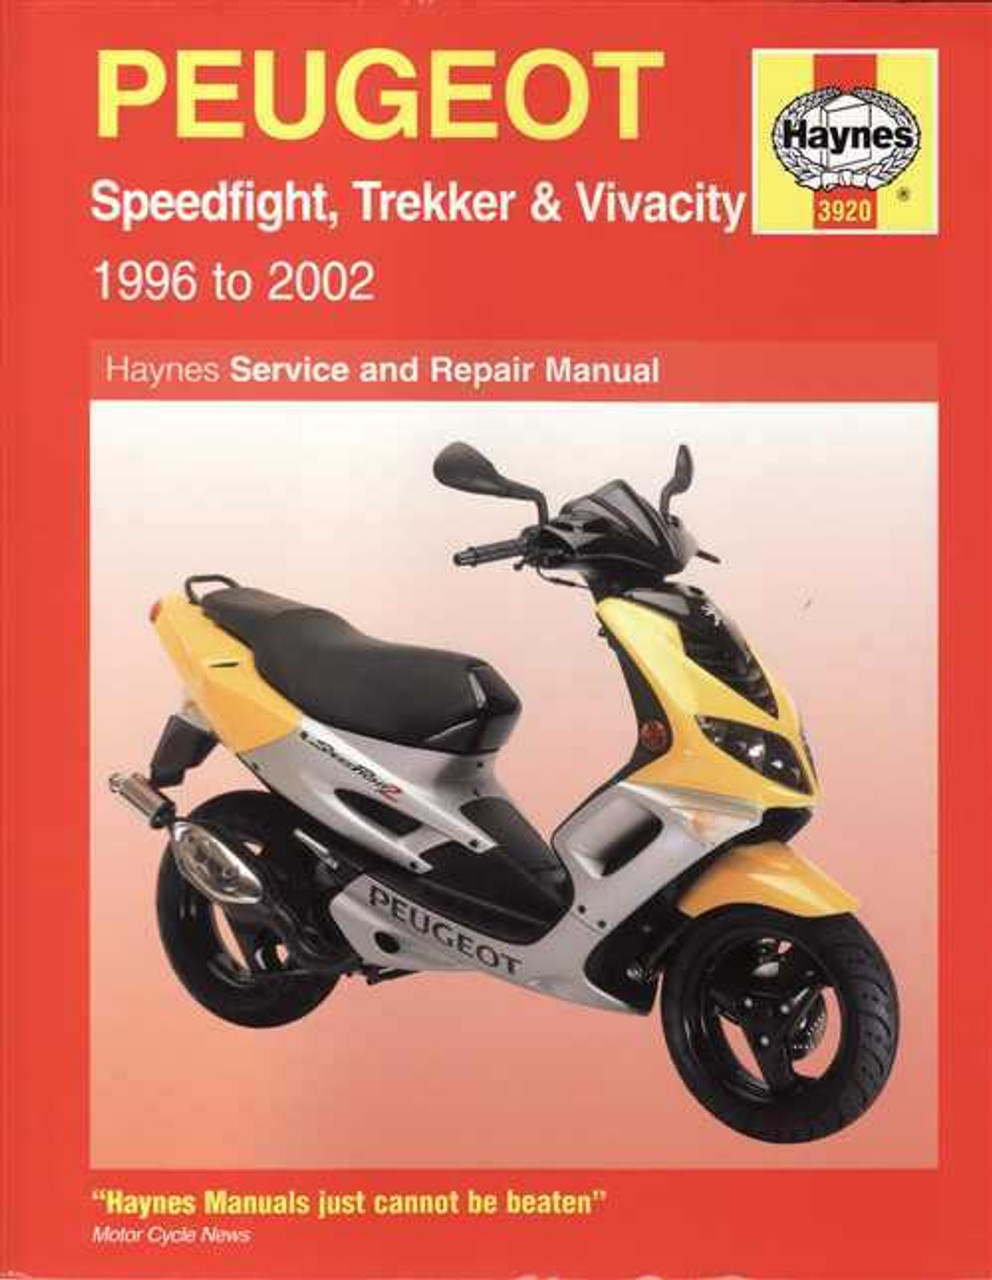 medium resolution of peugeot scooters speedfight trekker amp vivacity 1996 2002 workshop manual